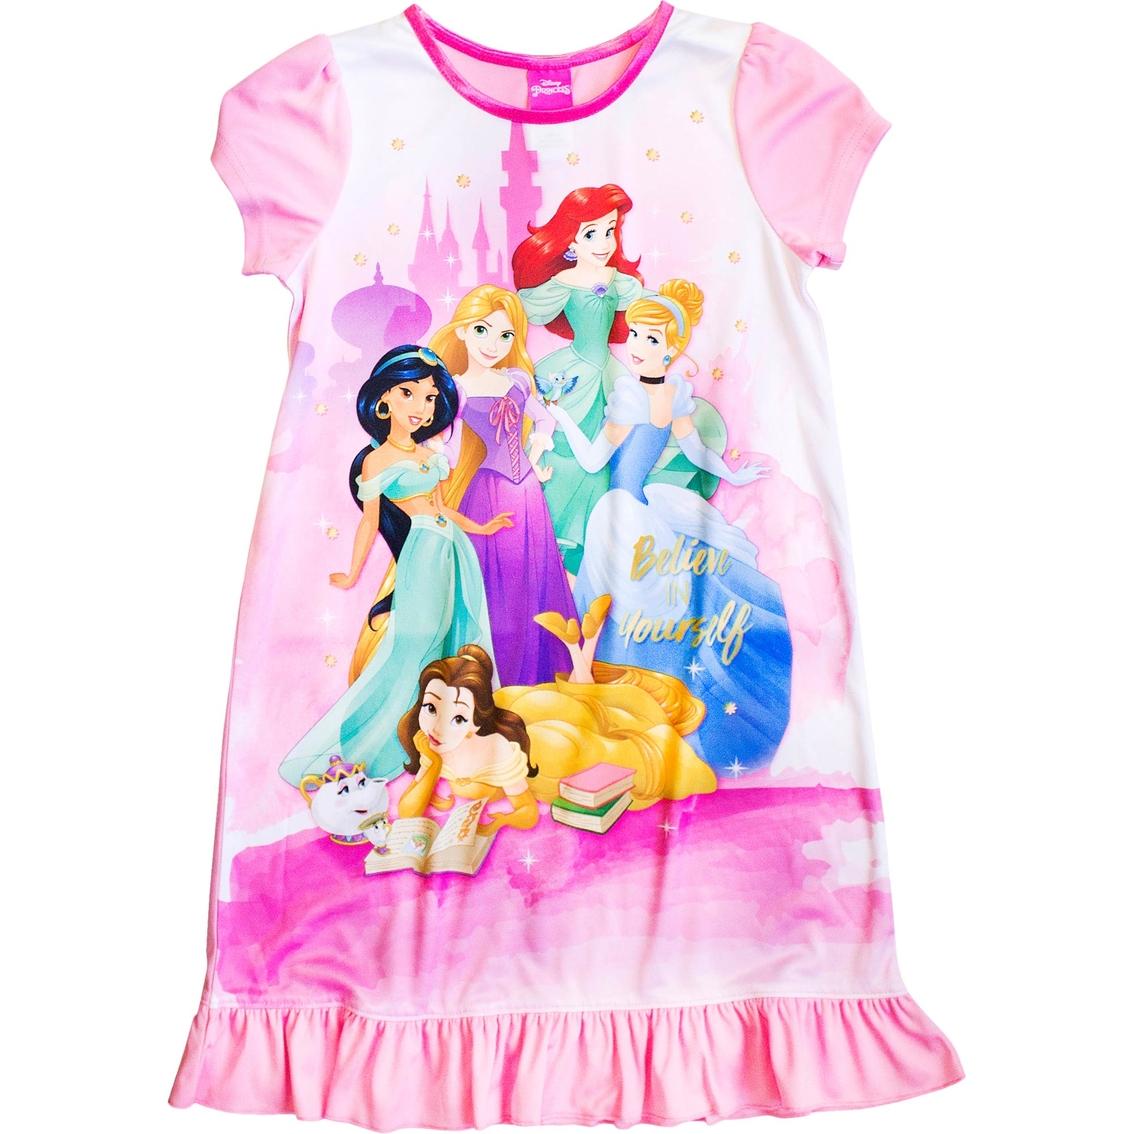 Disney Princesses Girl Nightgown, Size 8 | Girls 7-16 | Apparel ...